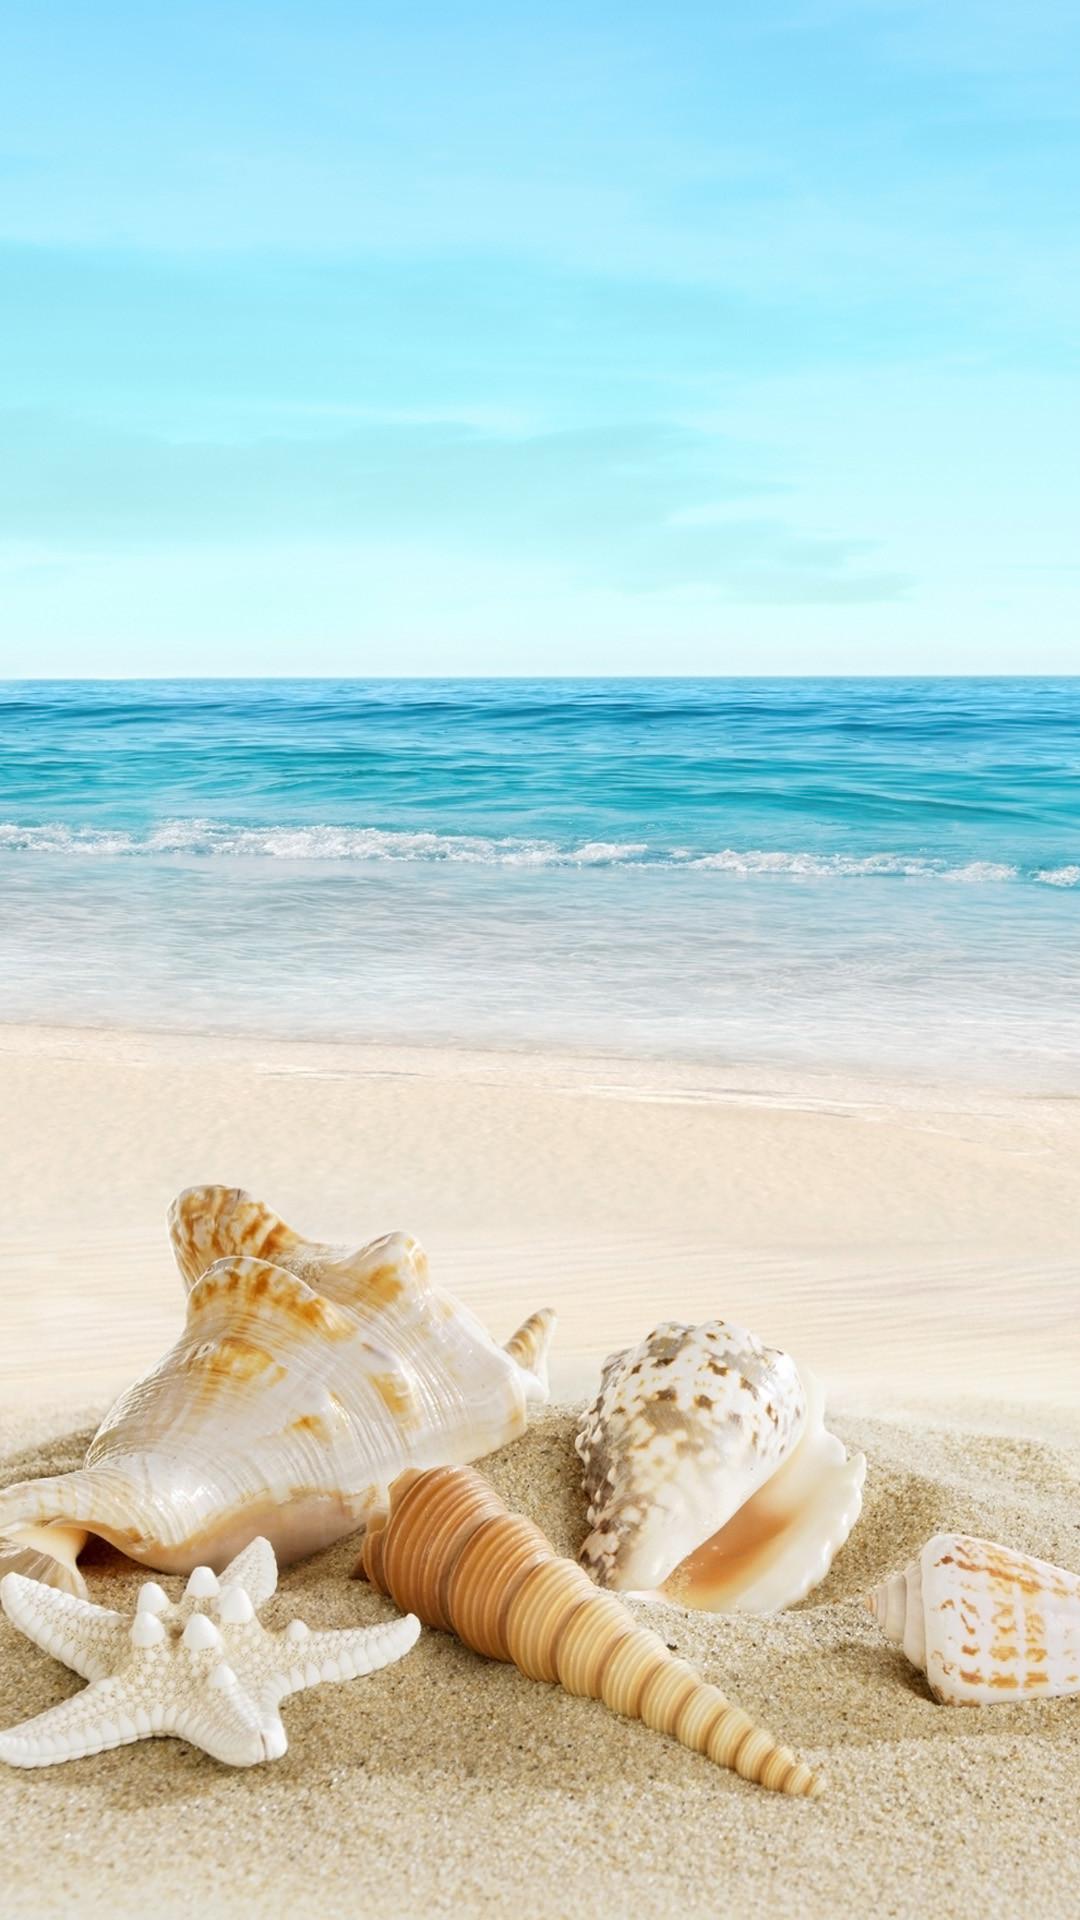 1080x1920 Nature Sunny Sea Shell Beach IPhone 6 Wallpaper